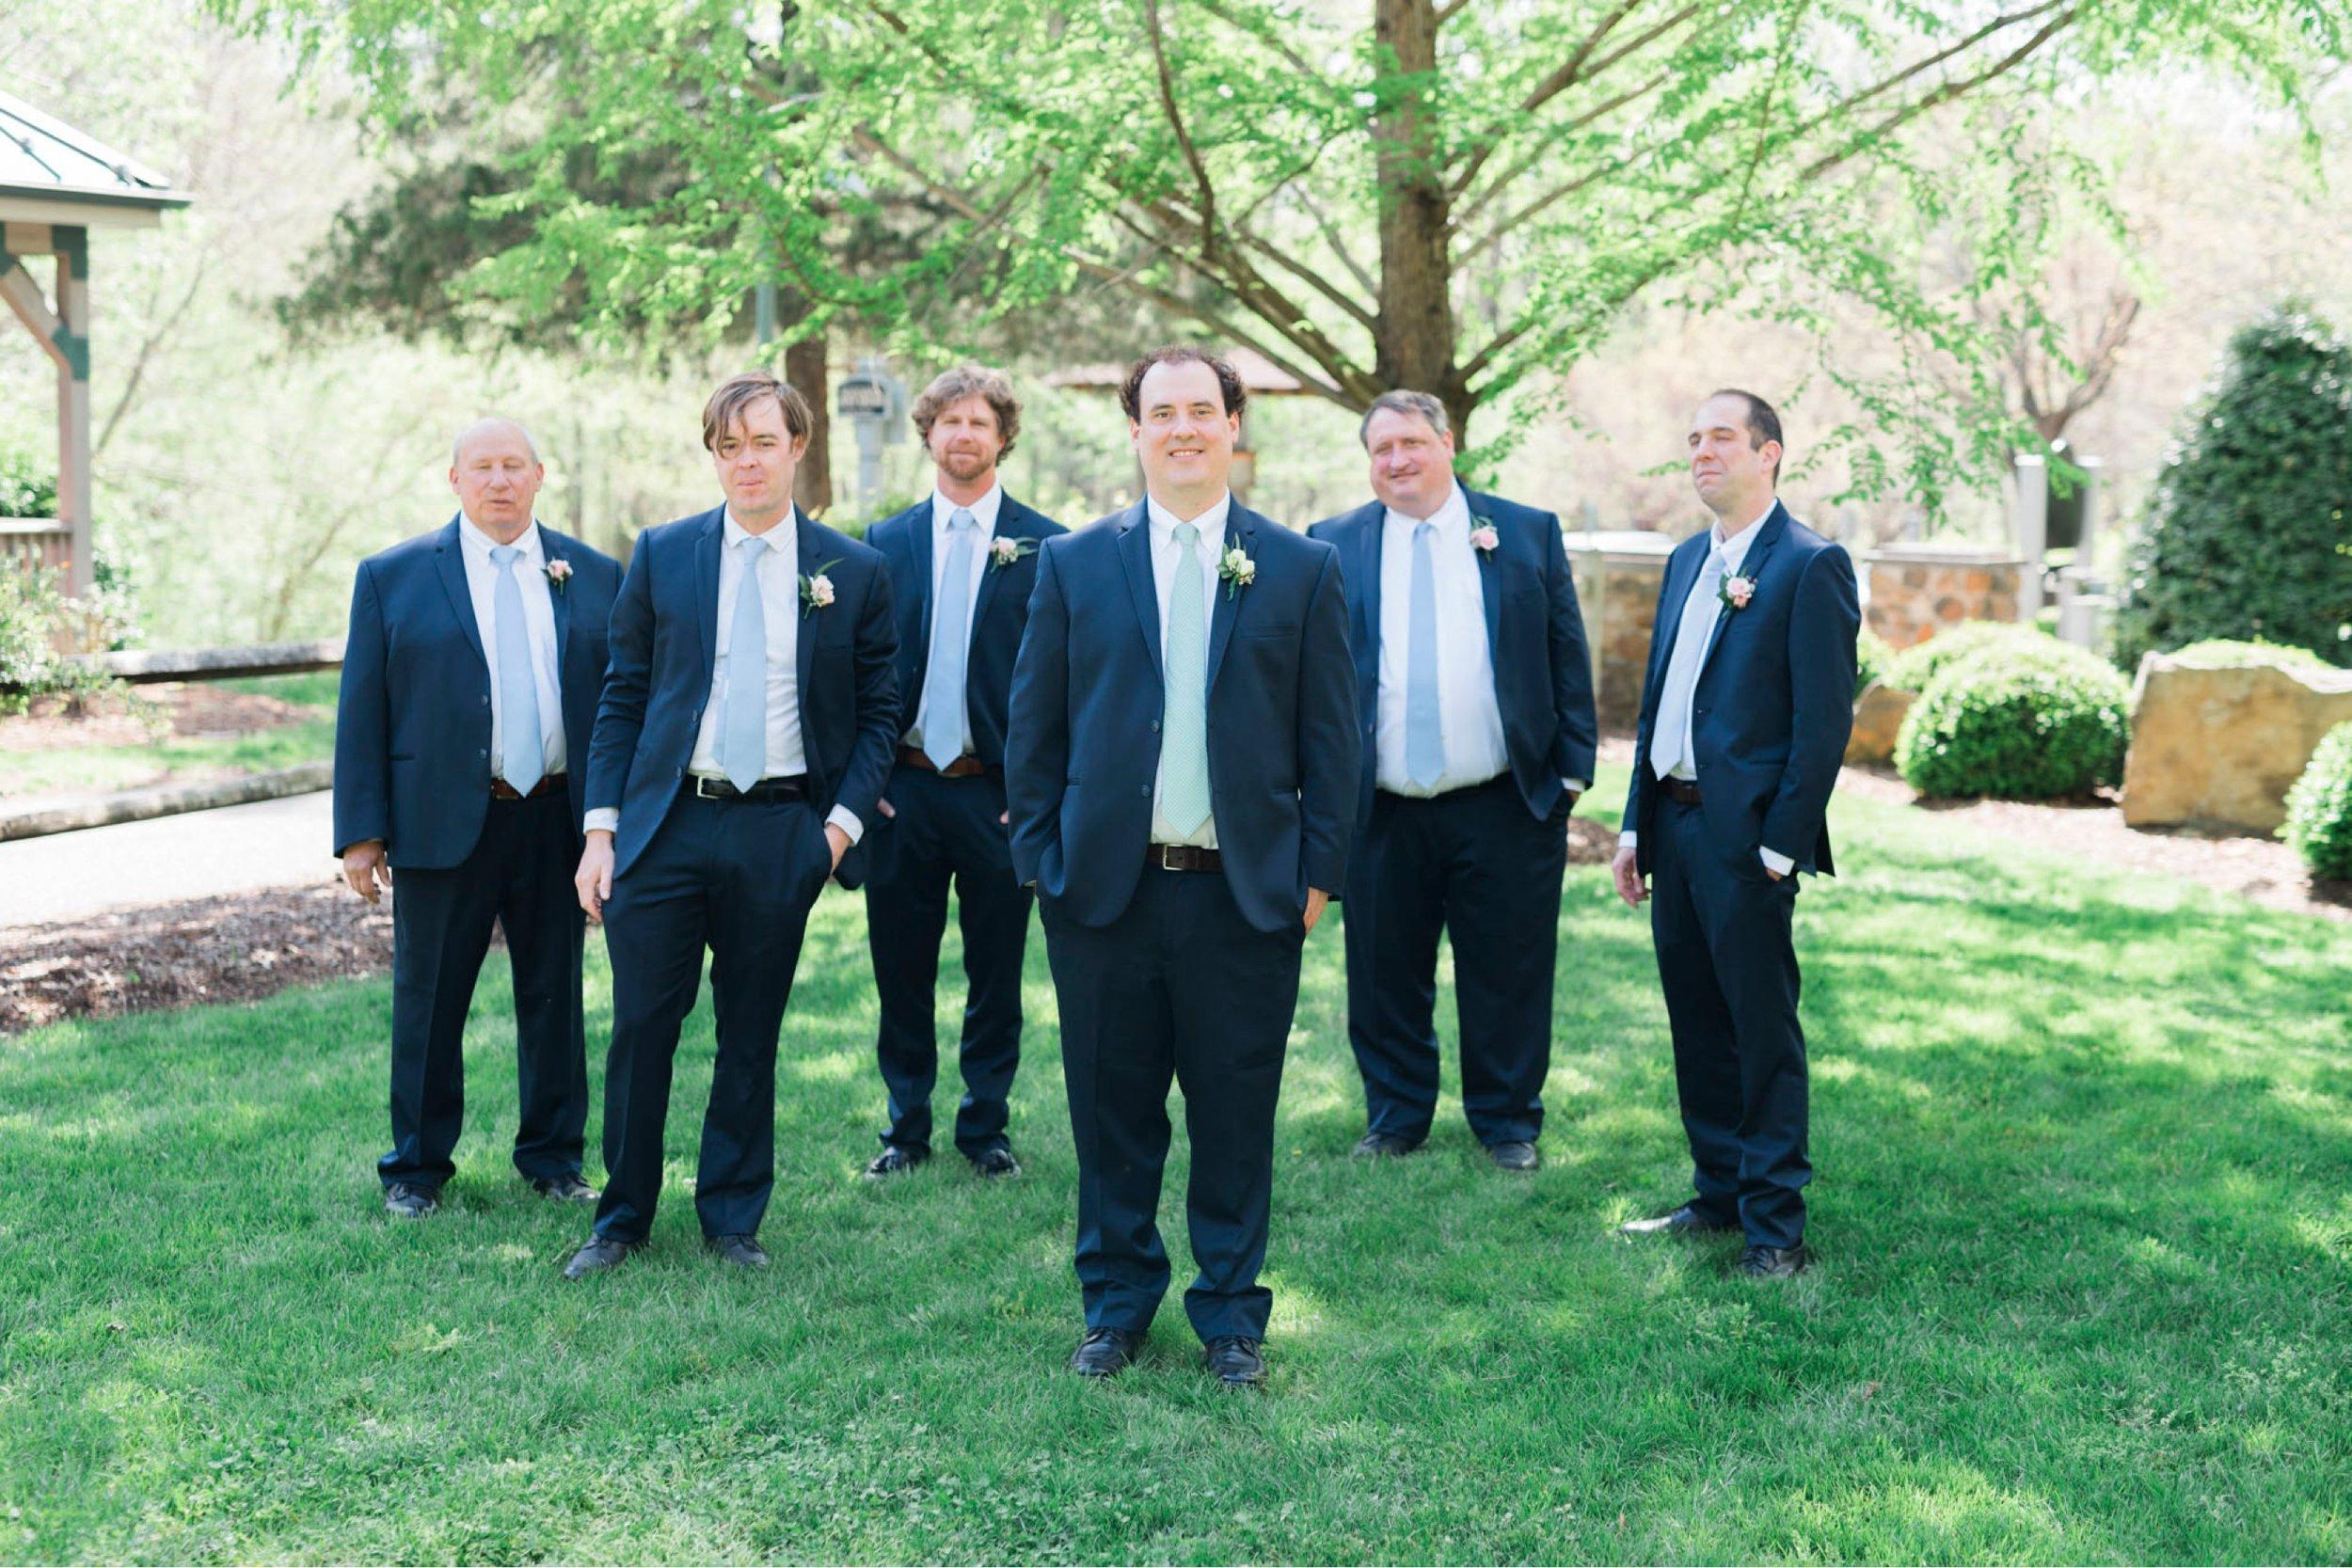 TheVirginianHotel_LynchburgVA_TheVirginianHotelWedding_Virginiaweddingphotographer_Lynchburgvawedding 34.jpg